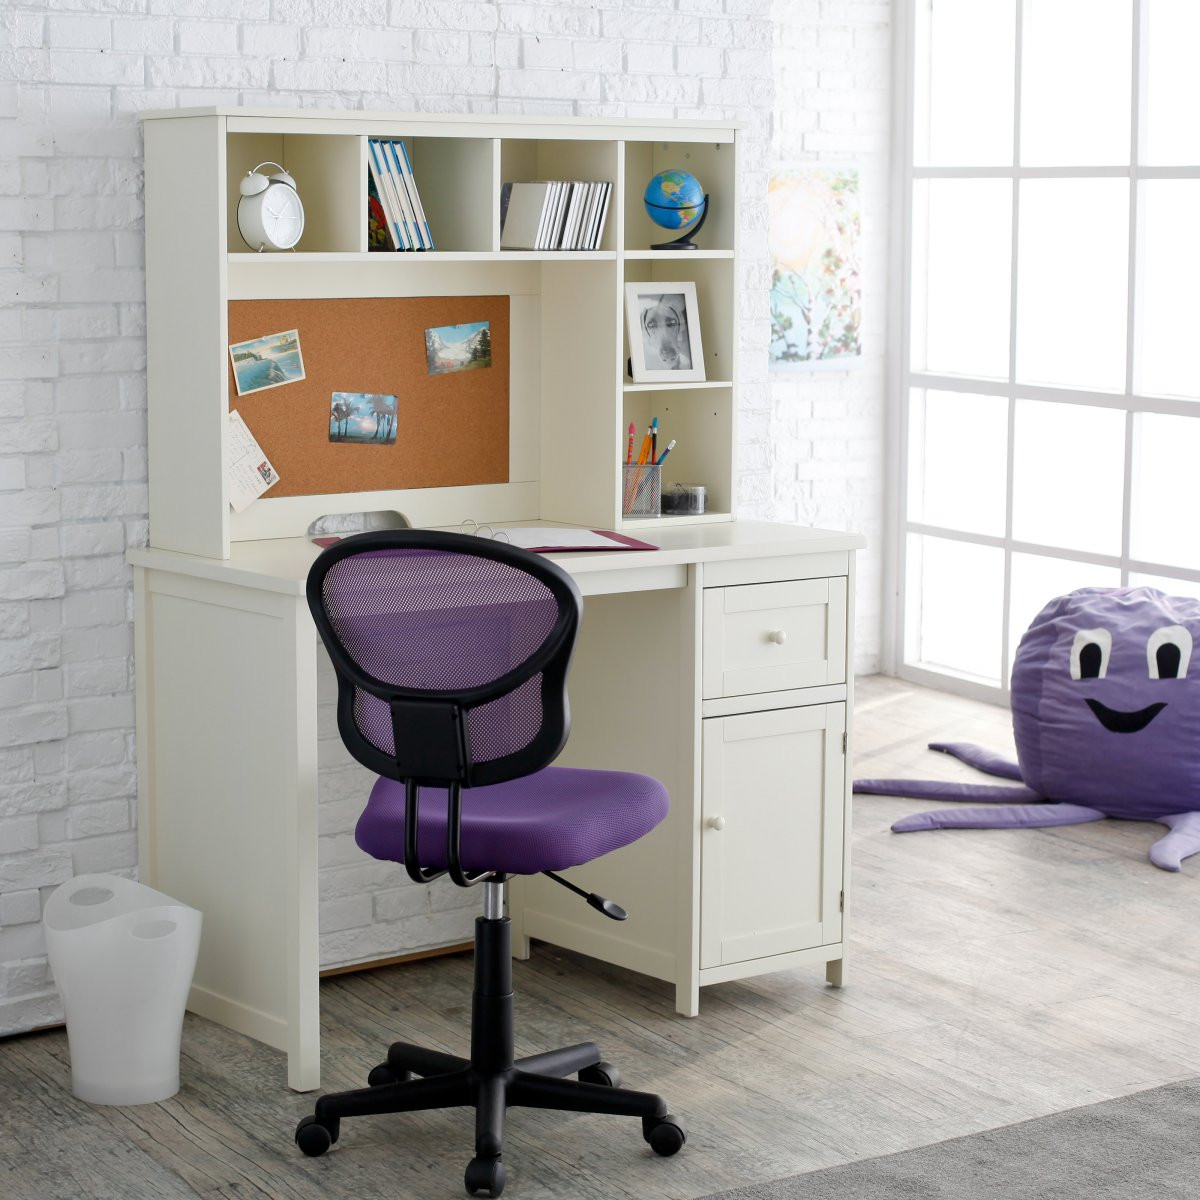 Best ideas about Desk For Bedroom . Save or Pin Desks for Bedrooms Home Furniture Design Now.